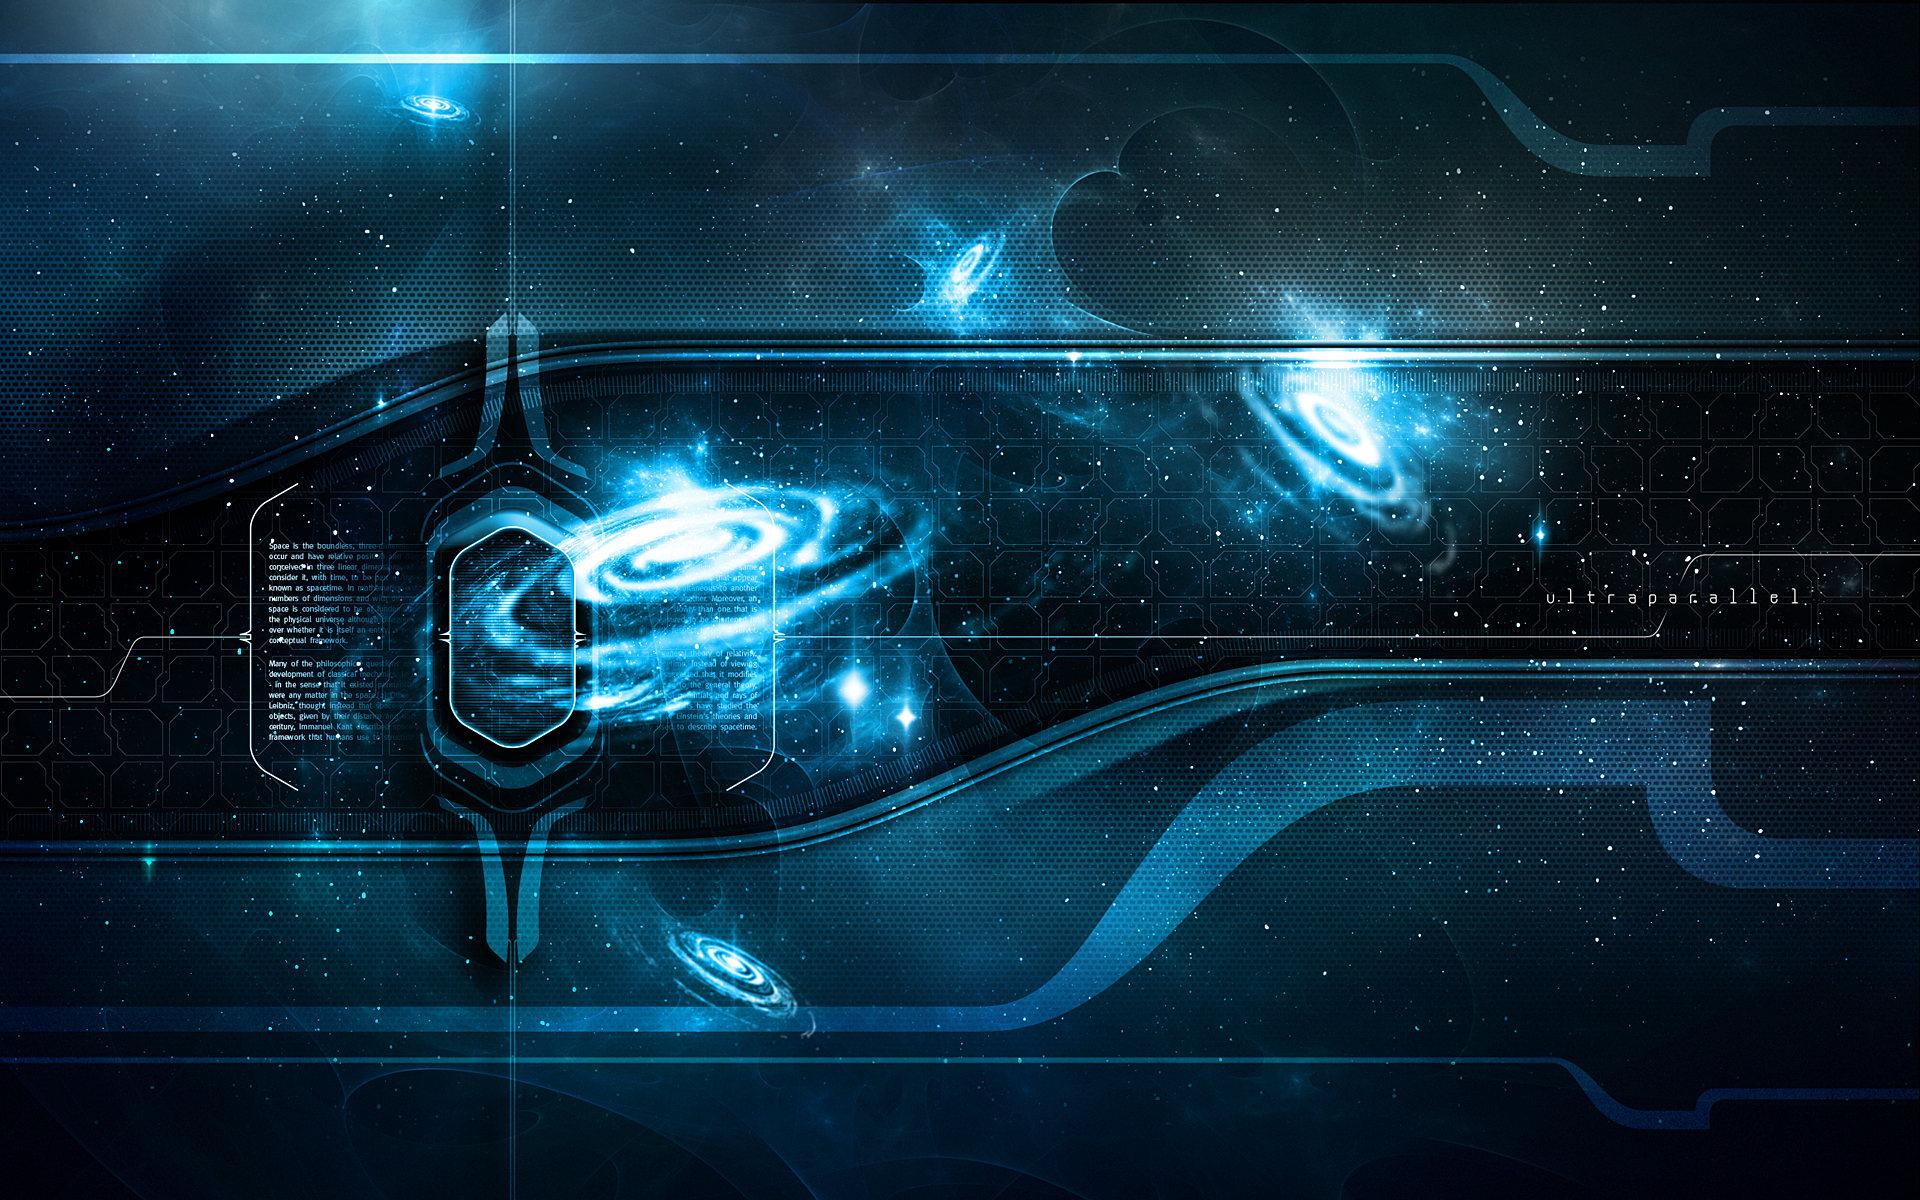 Theme Bin Blog Archive Ultraparallel Quasar Blue HD Wallpaper 1920x1200